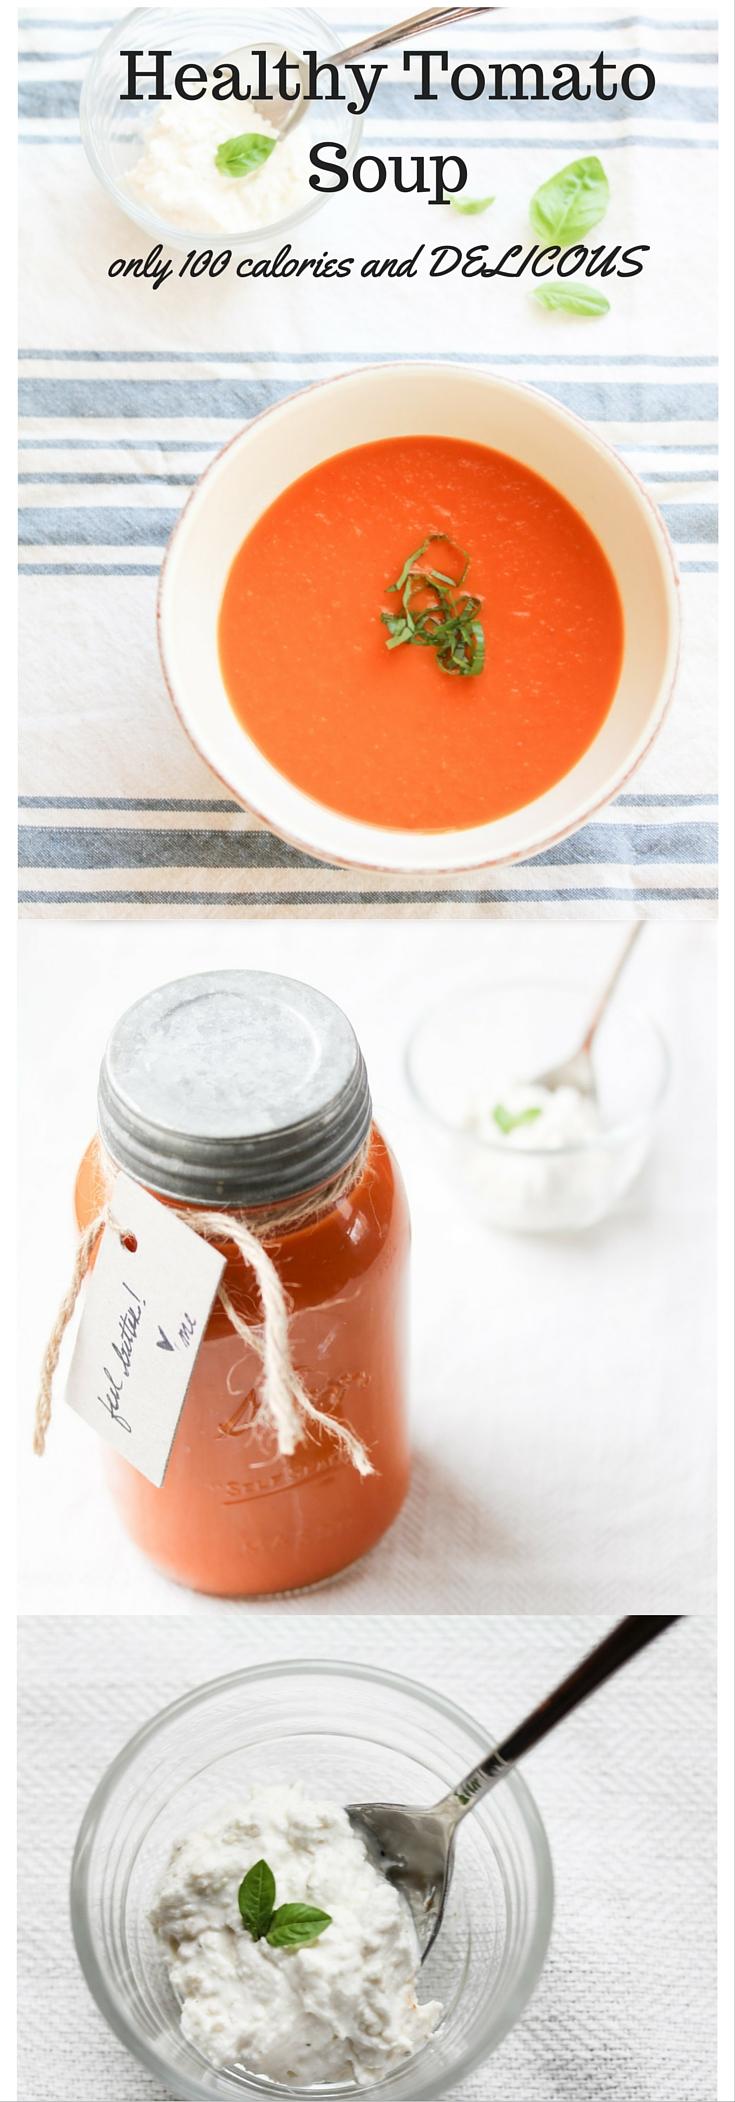 Healthy Tomato Soup